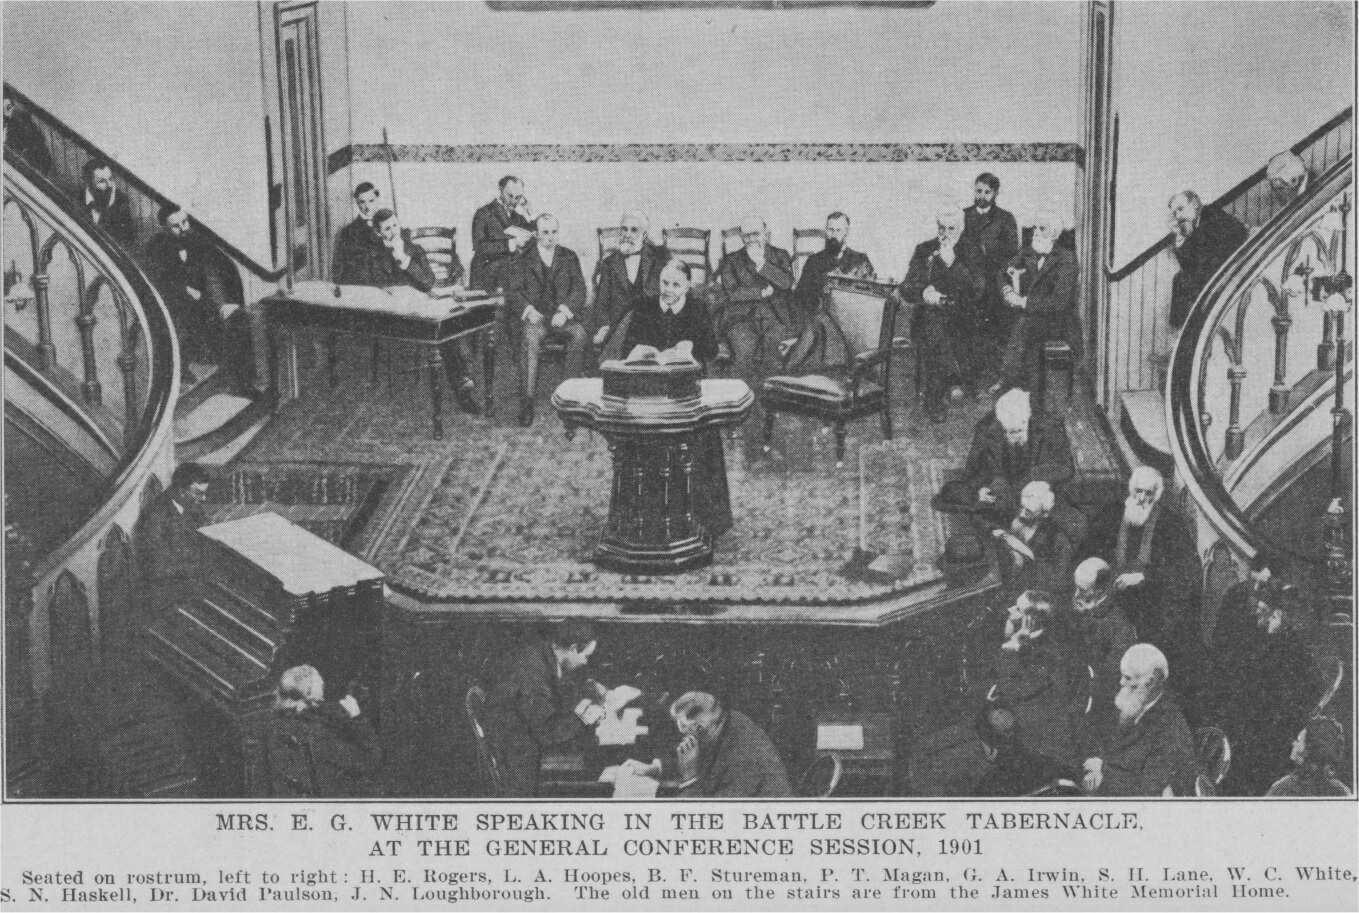 ellen white at gc session 1901